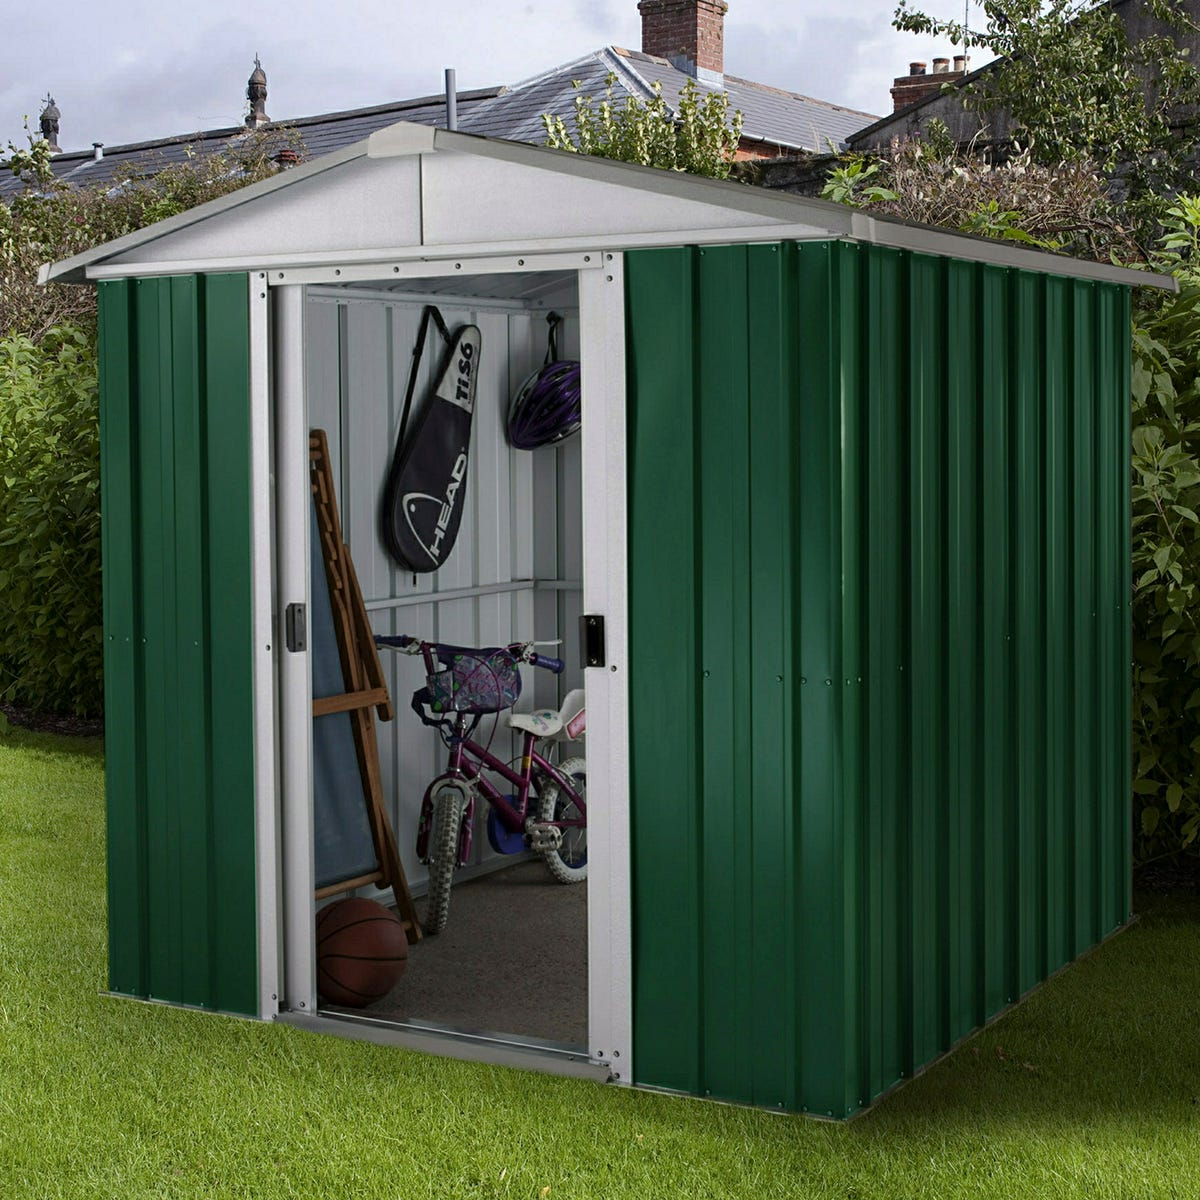 Yardmaster Emerald No Floor Metal Apex Shed 6 x 6ft